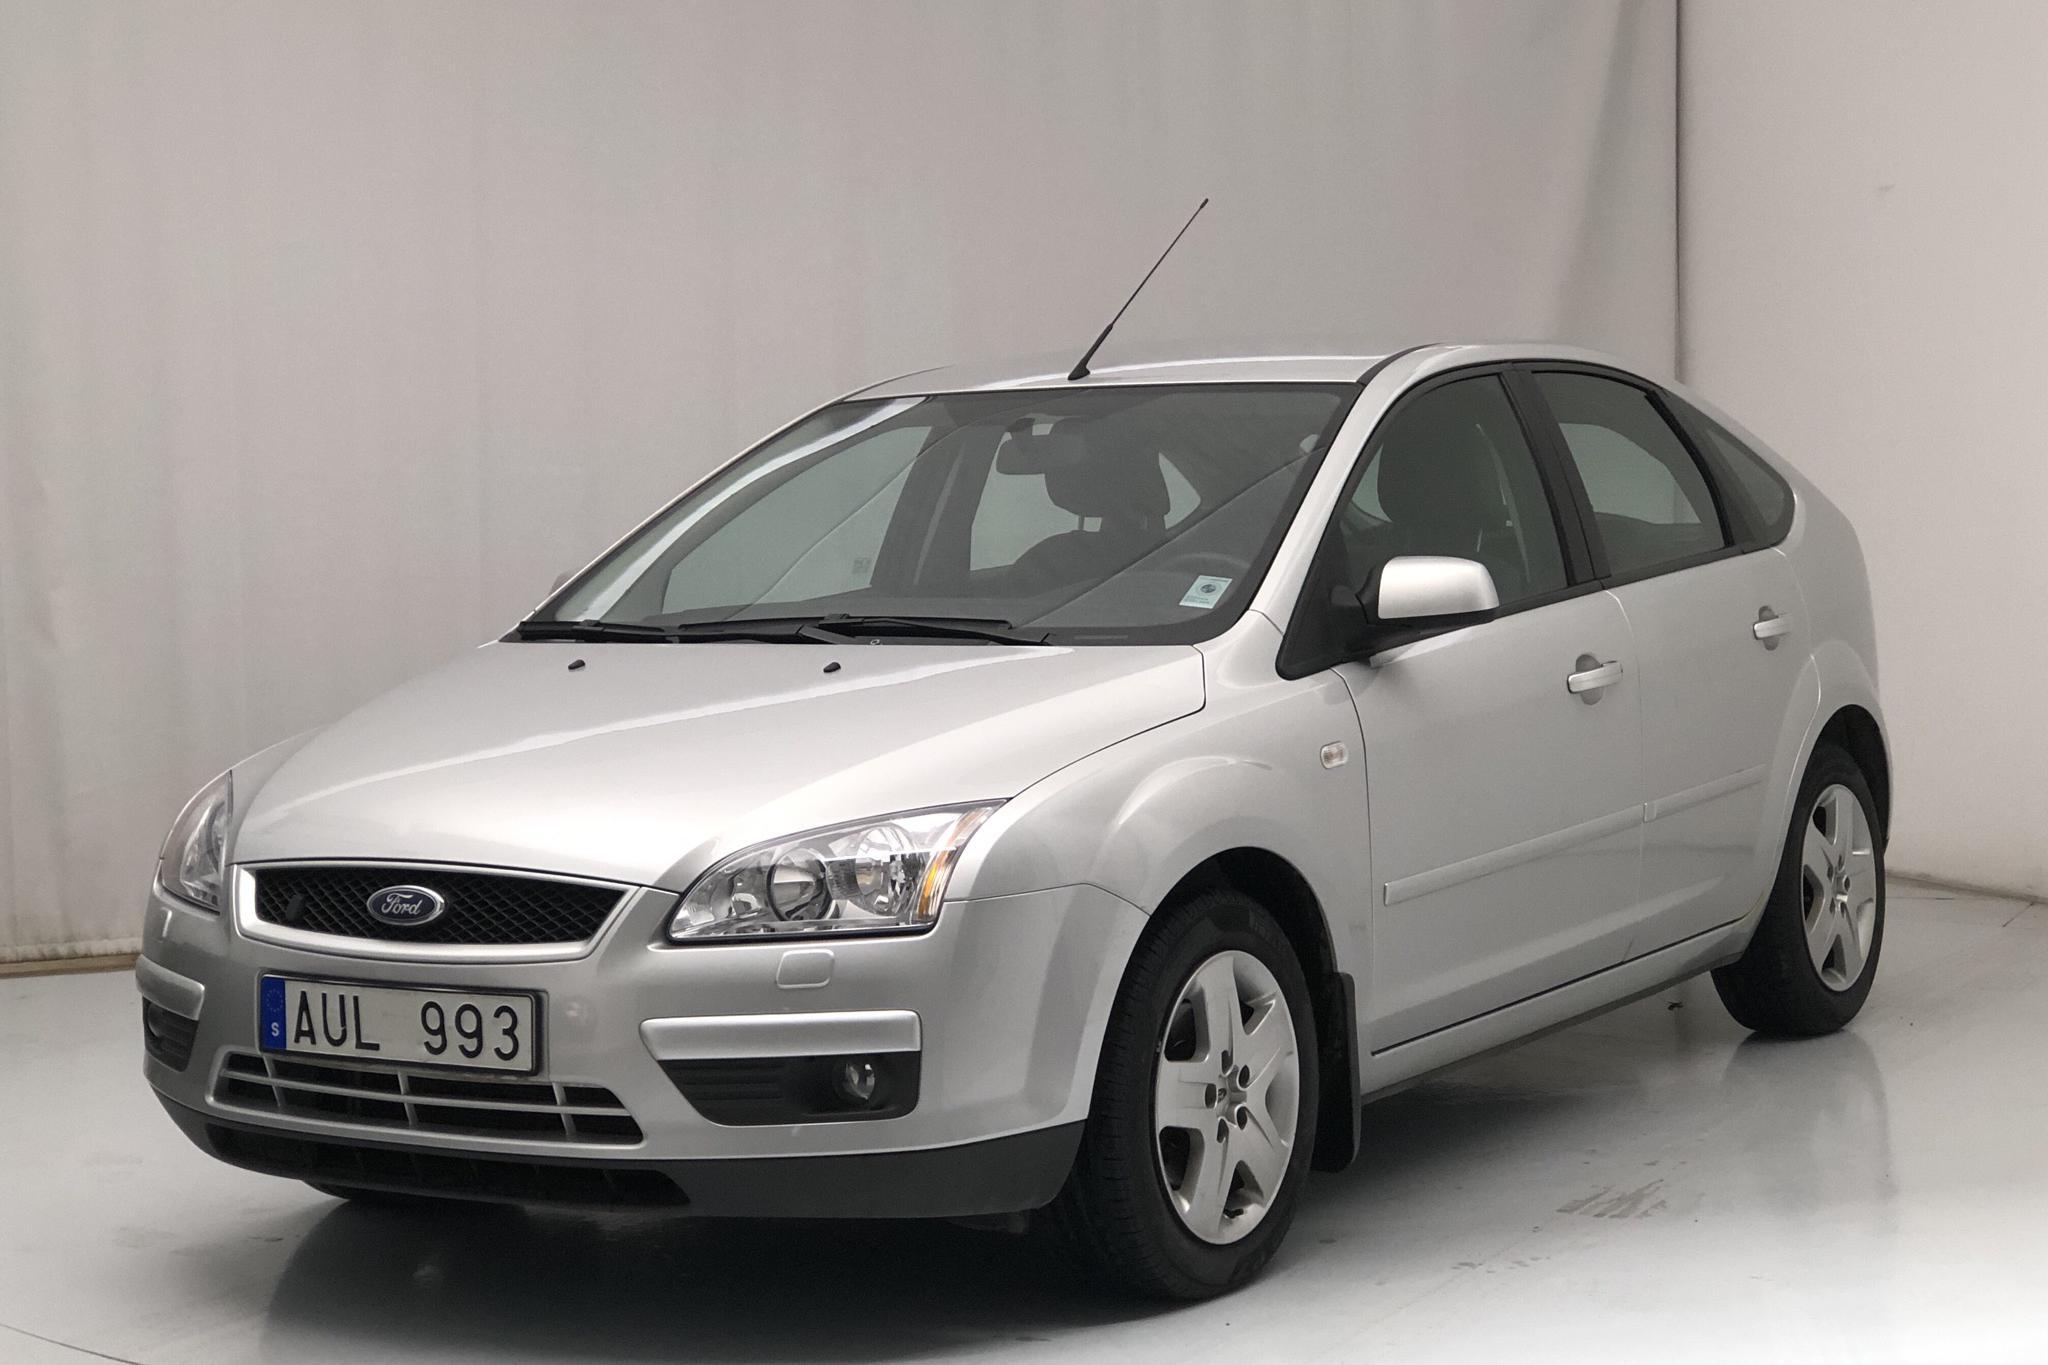 Ford Focus 1.8 Flexifuel 5dr (125hk) - 78 070 km - Manual - gray - 2007